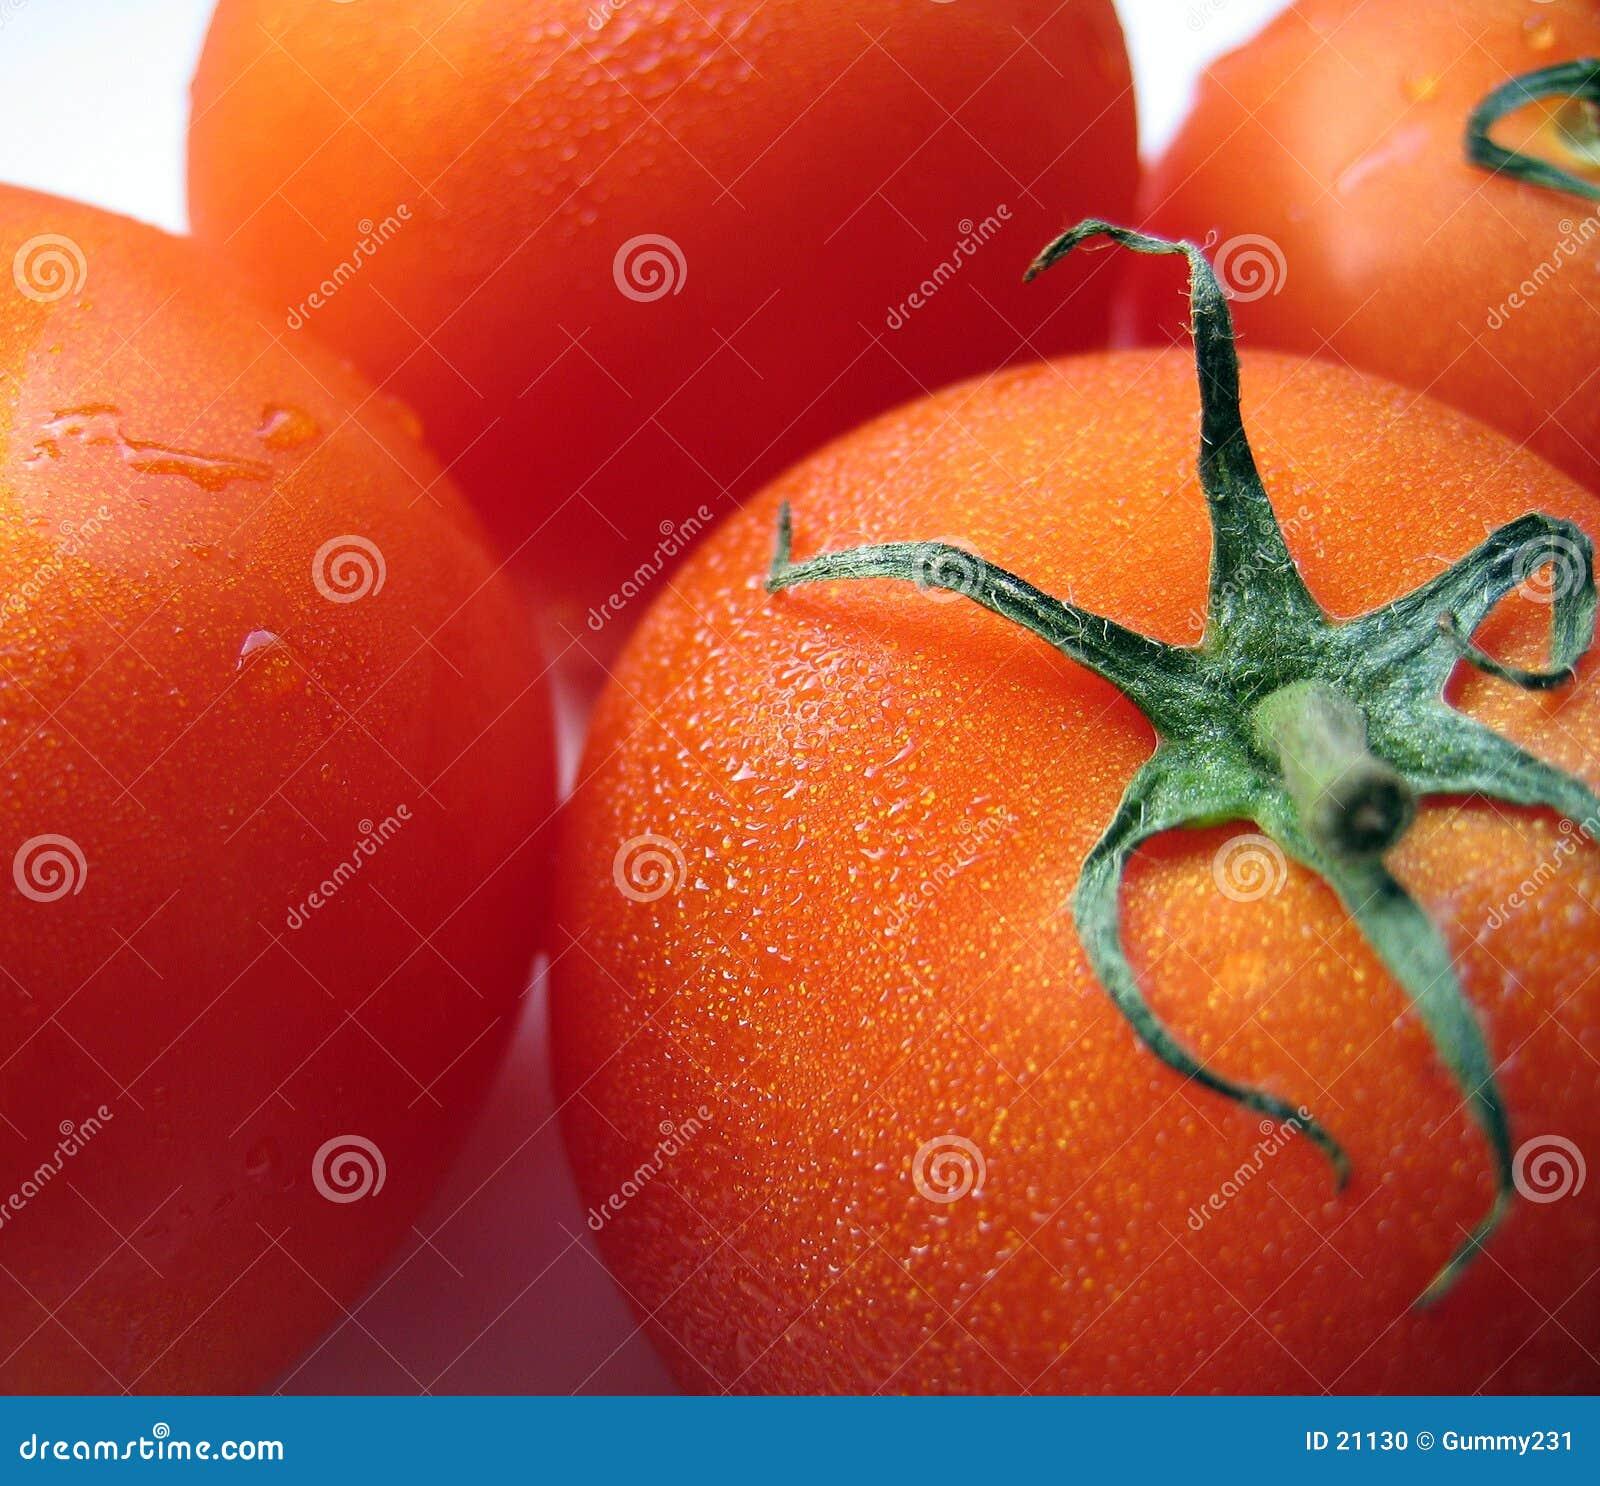 Tomates maduros regordetes